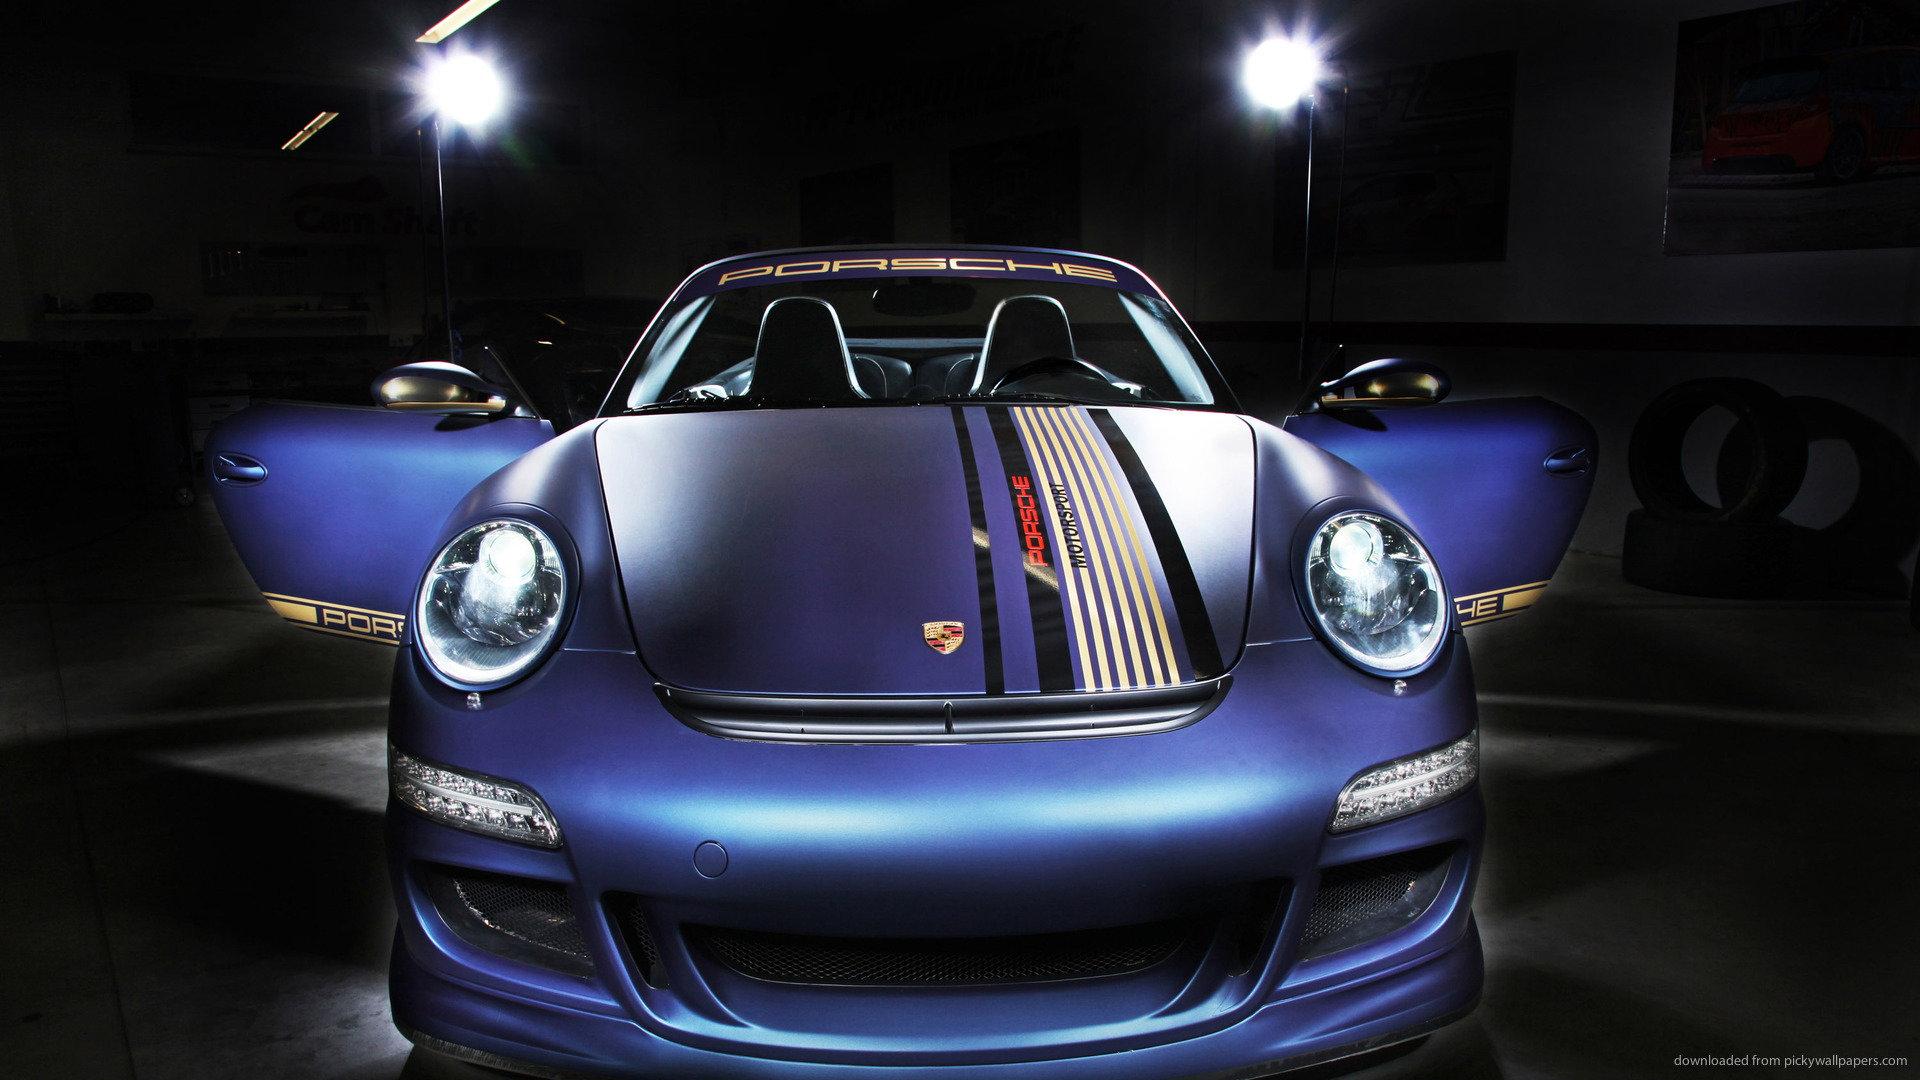 Porsche 997 How To Open The Hood With A Dead Battery Rennlist